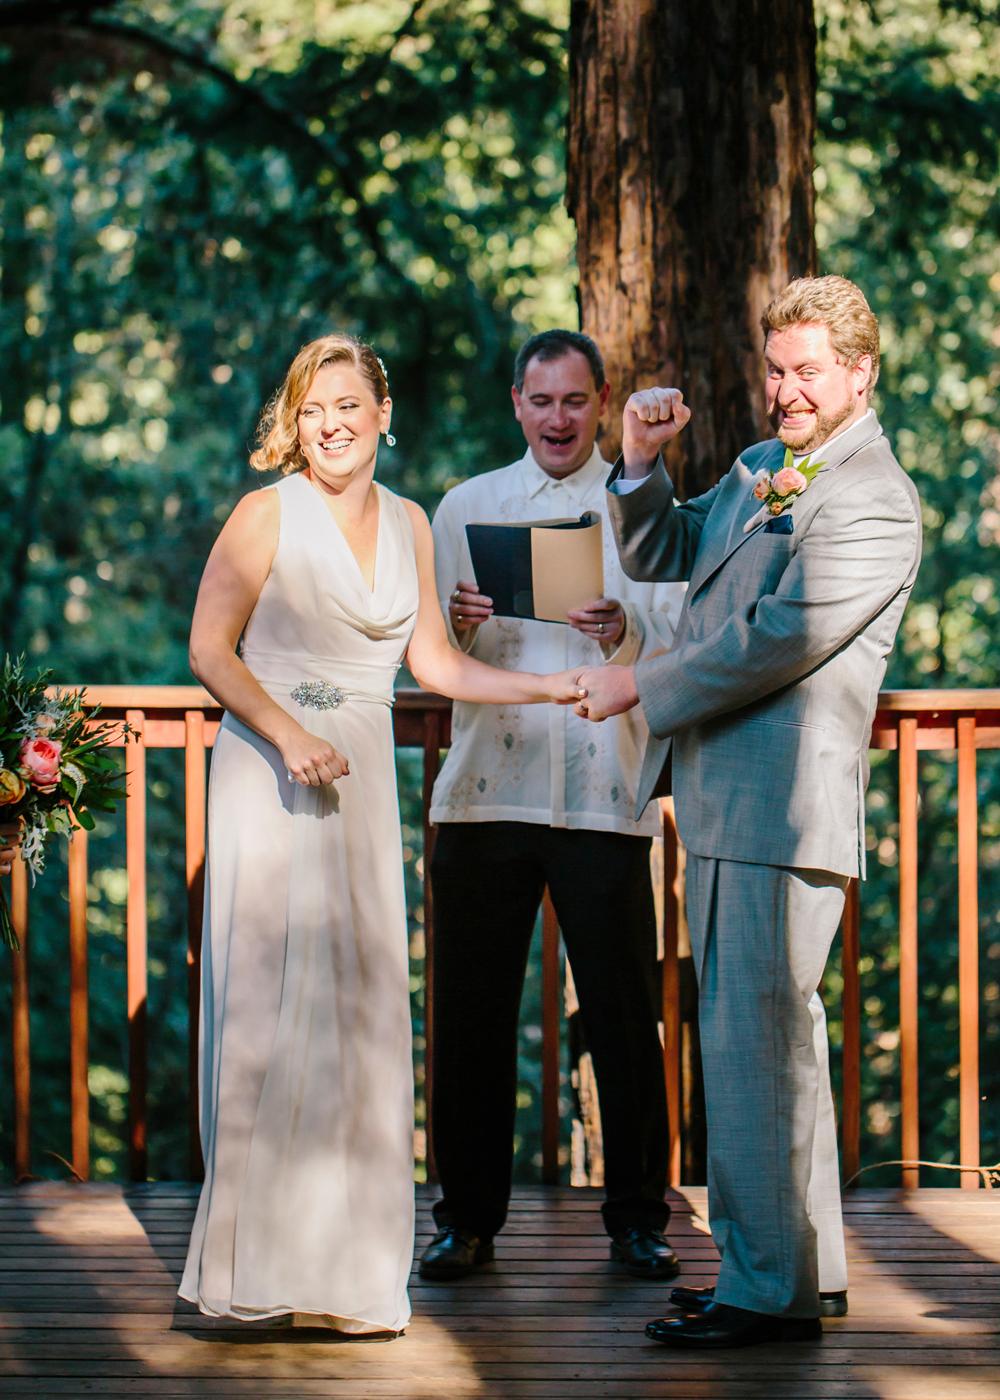 pema-osel-ling-santa-cruz-wedding-photography-lilouette-48.jpg